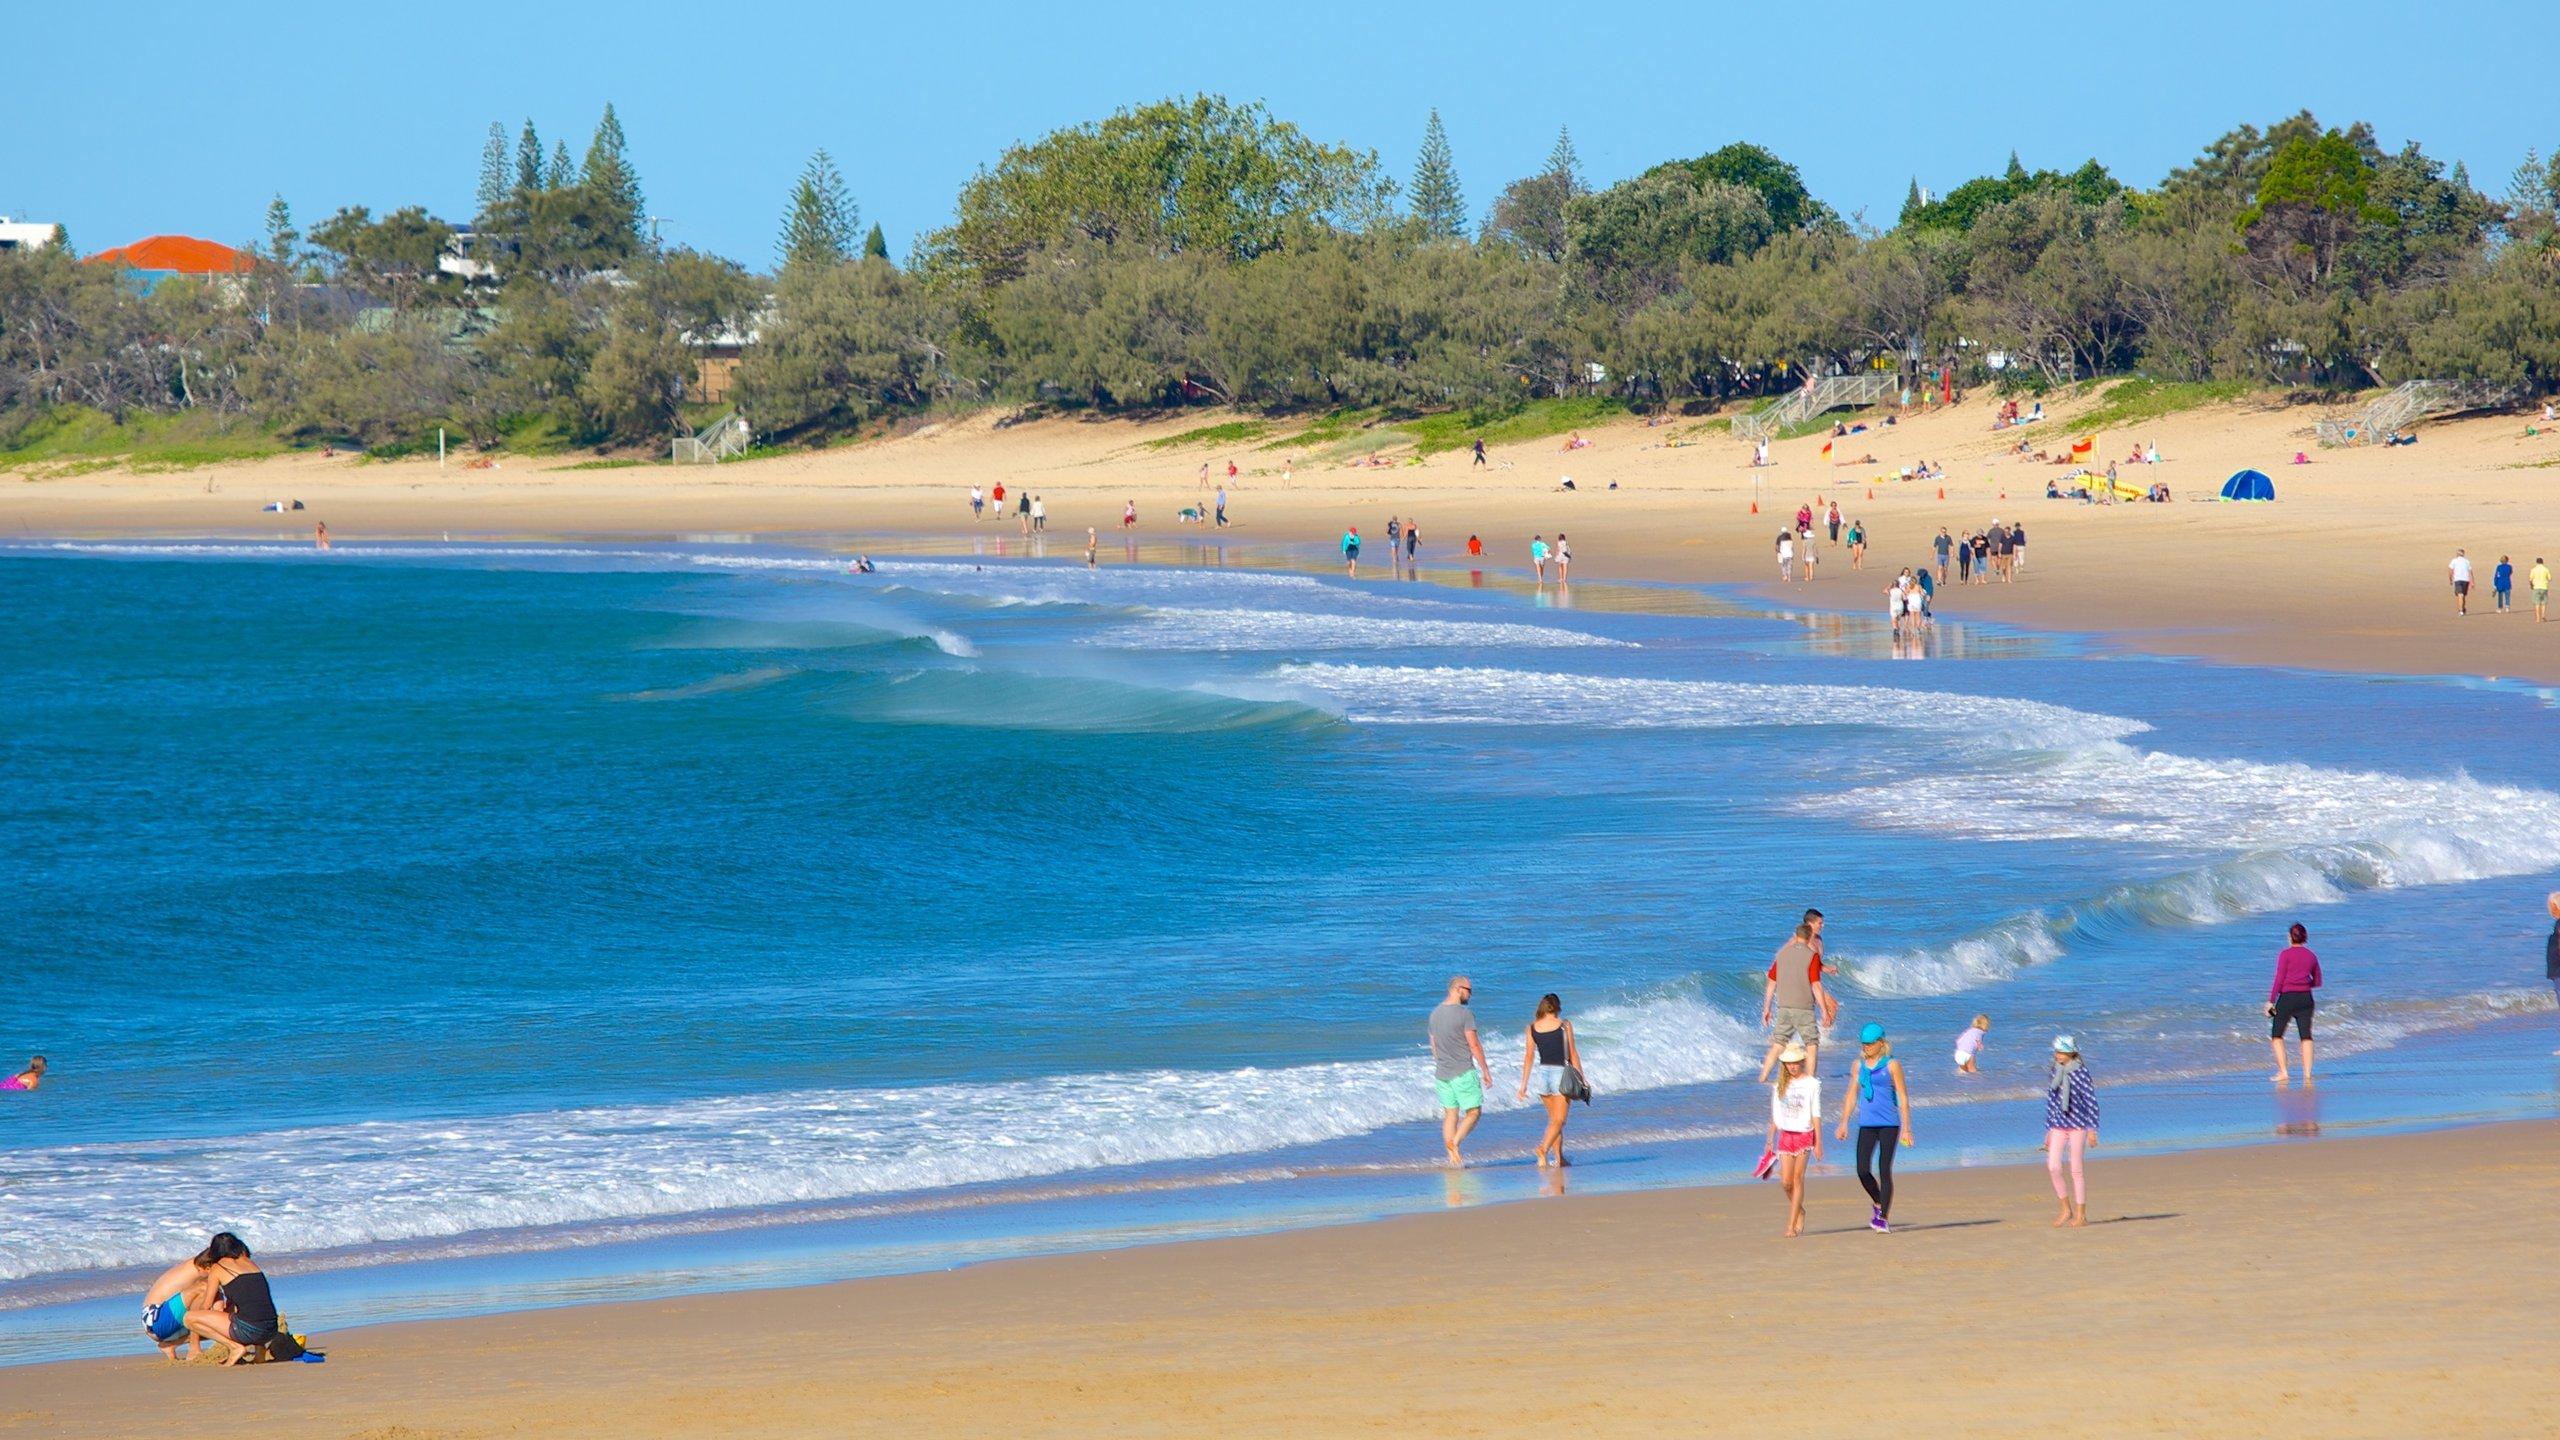 Mooloolaba Beach, Sunshine Coast, Queensland, Australië